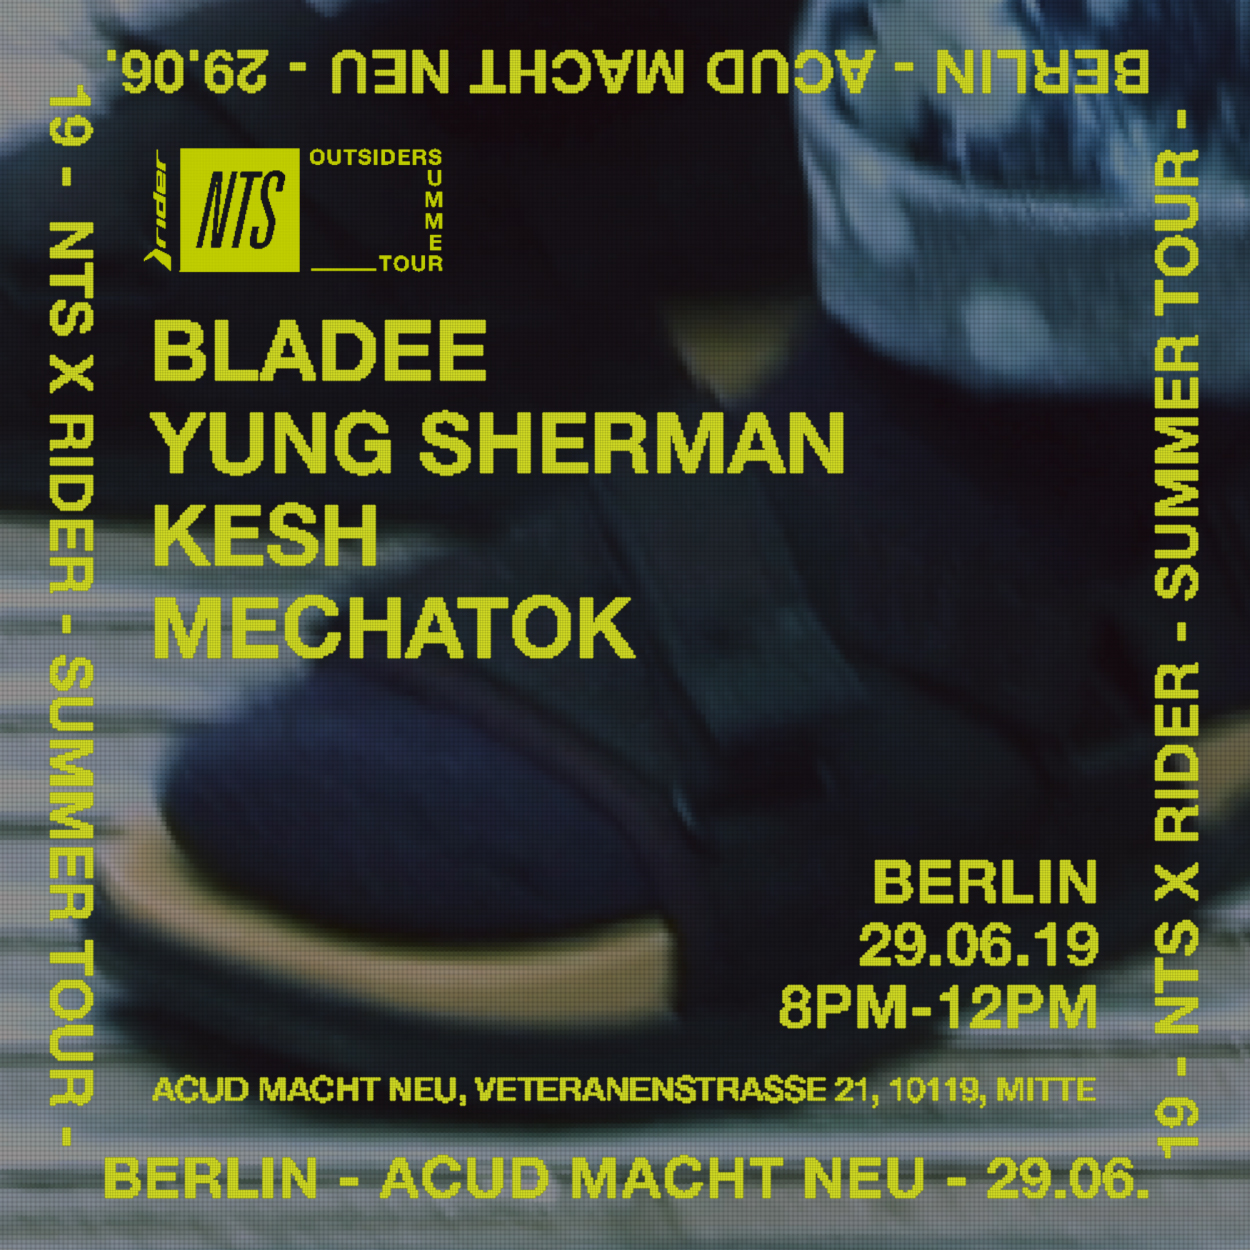 Square Still - Event - NTS x Rider Outsiders Tour - Bladee, Yung Sherman, Mechatok @ Acud Berlin.jpg